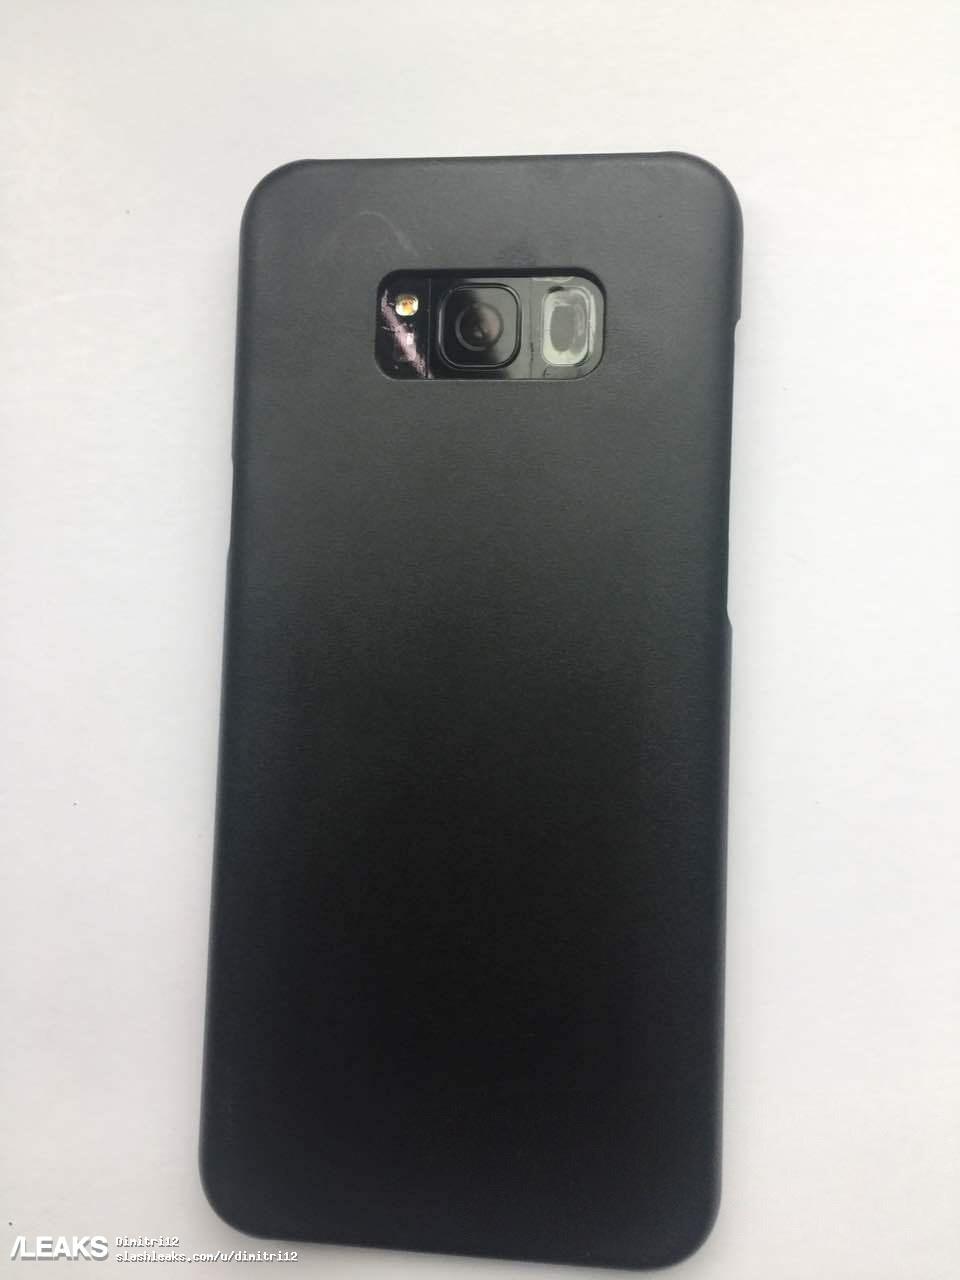 Galaxy S8 Leak KK 3